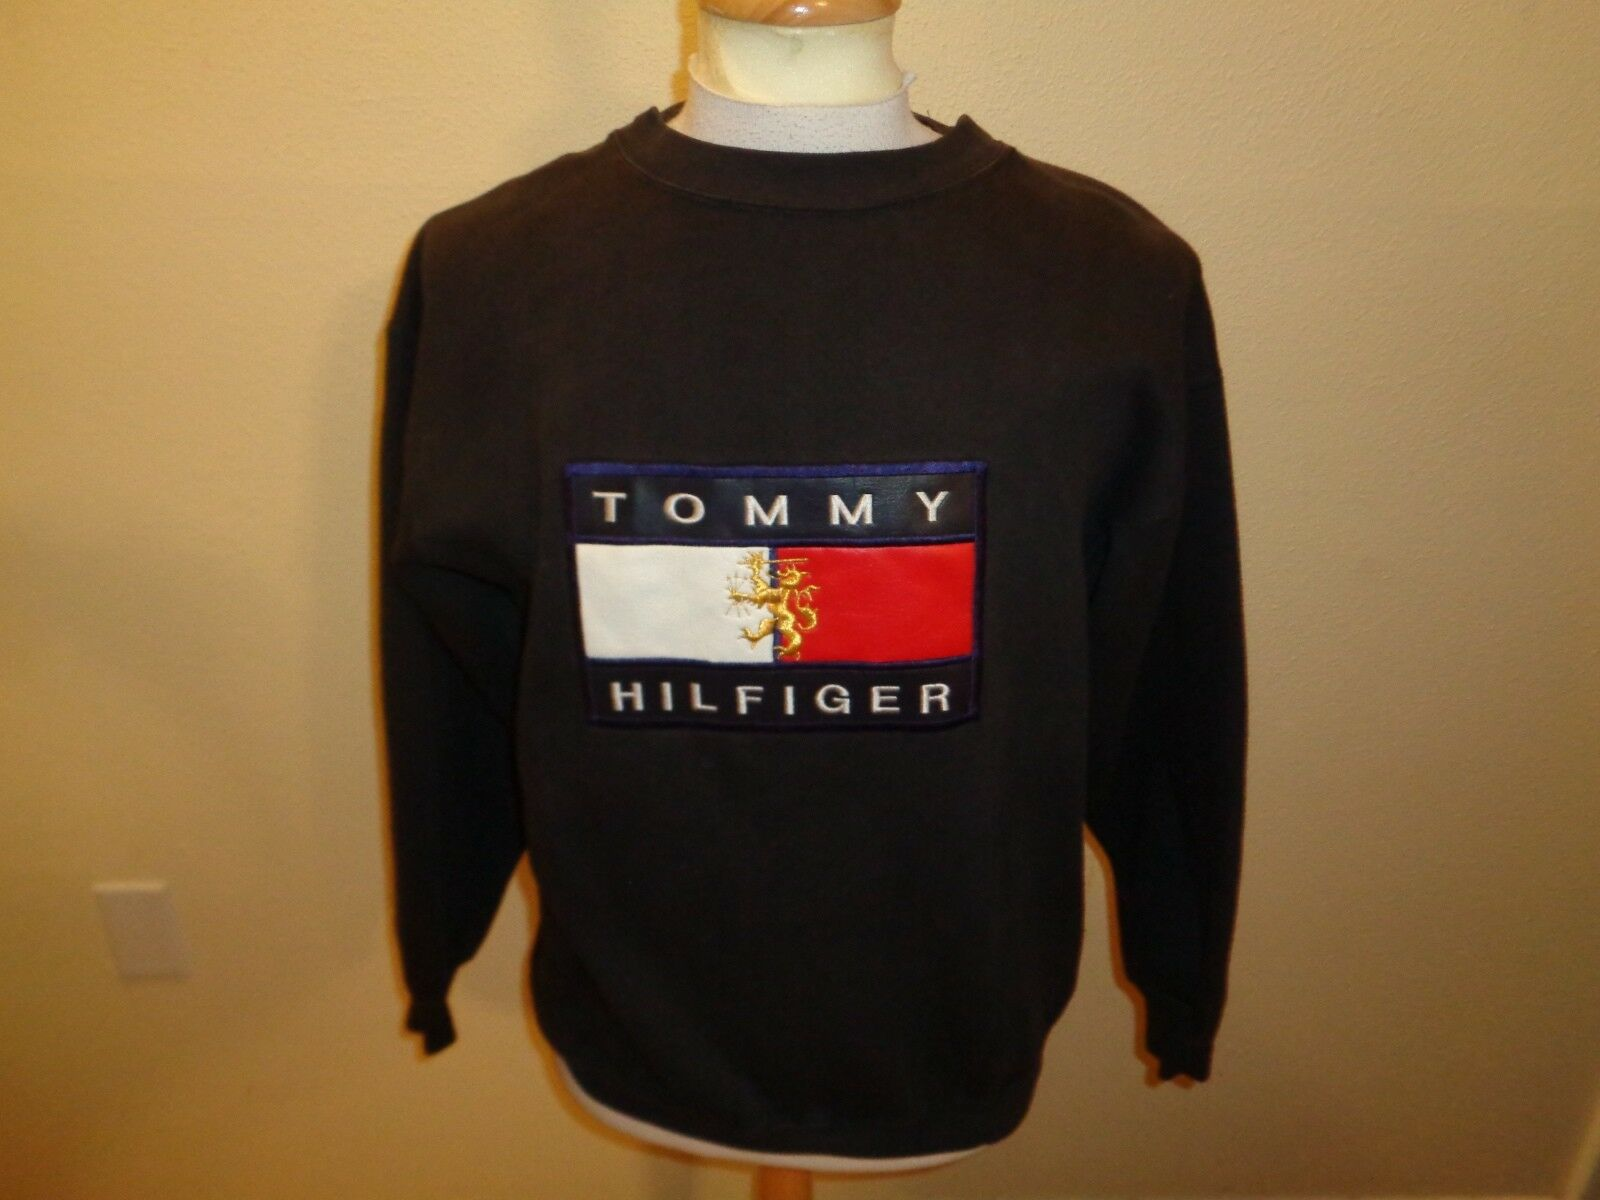 VTG 90s M/XL  Herren Tommy Hilfiger StiefelLEG spell out flag patch sweatshirt shirt